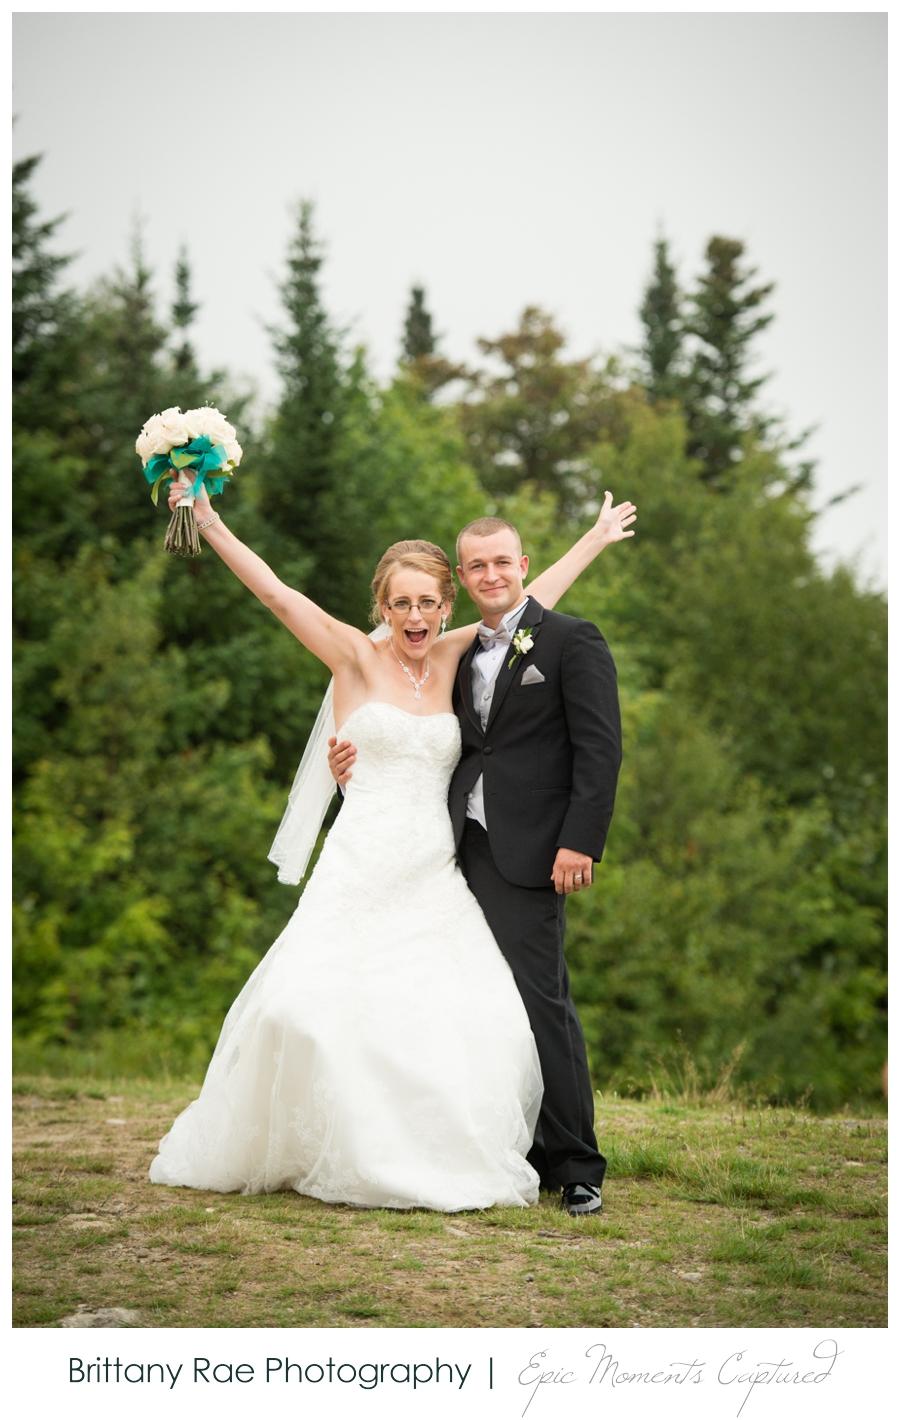 Peak Lodge Sunday River Wedding in Bethel Maine - 19